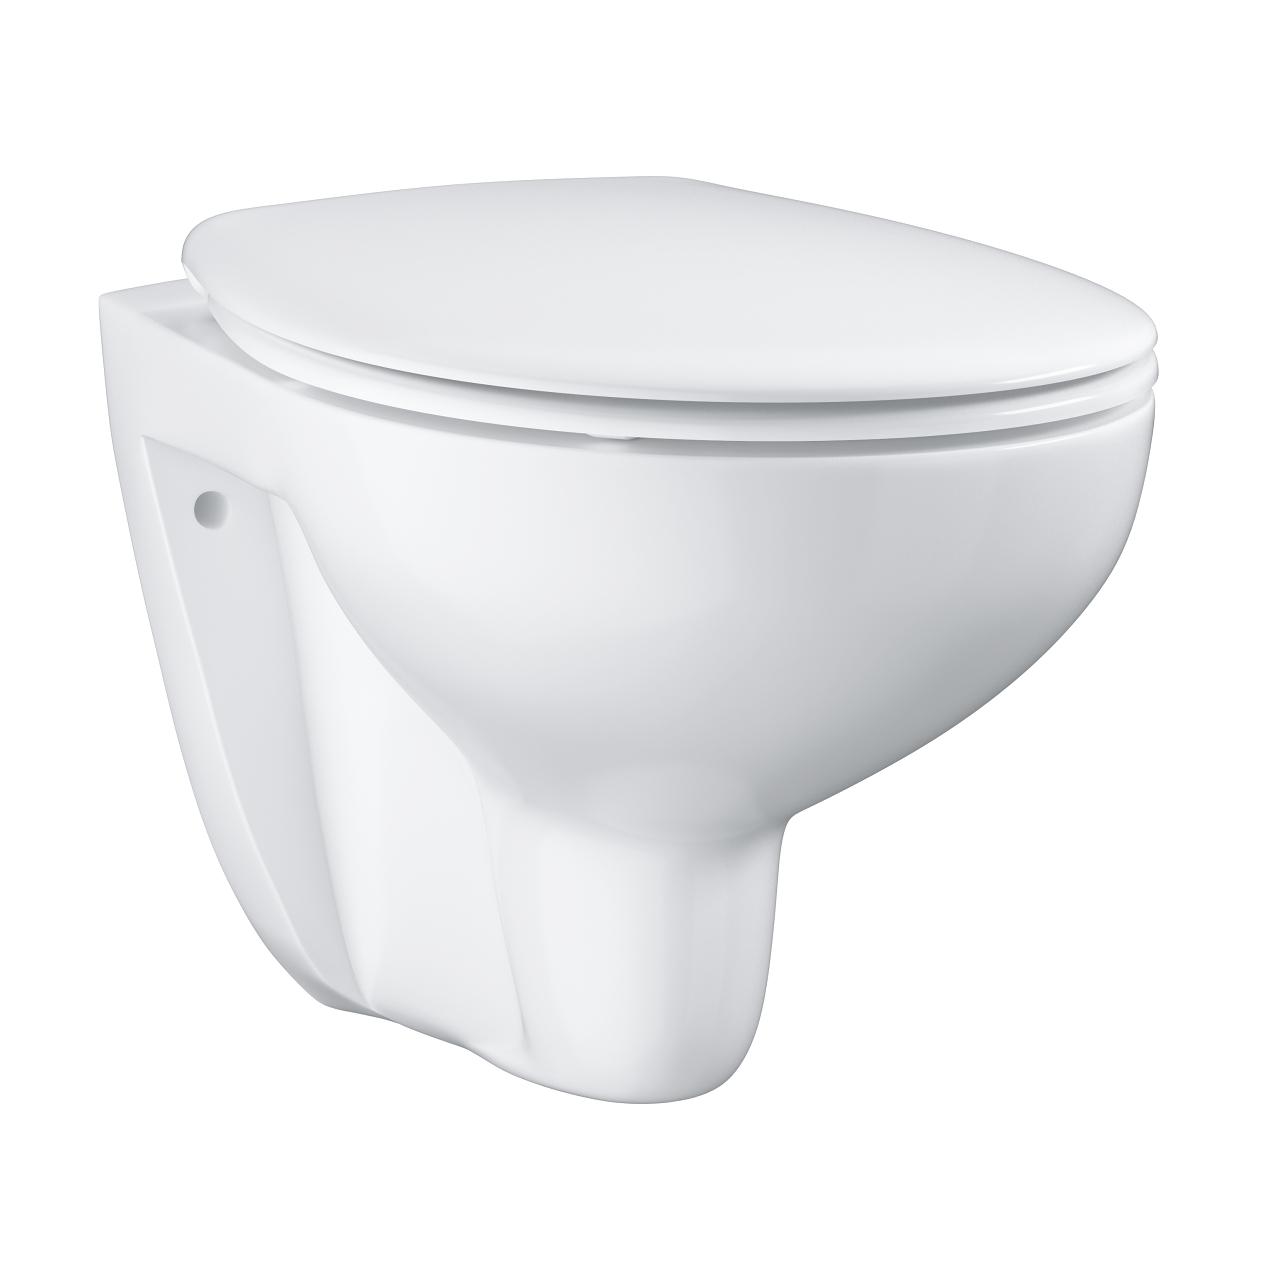 Фото - Унитаз подвесной Grohe 39351000 Bau Ceramic, сид. с м/лифтом